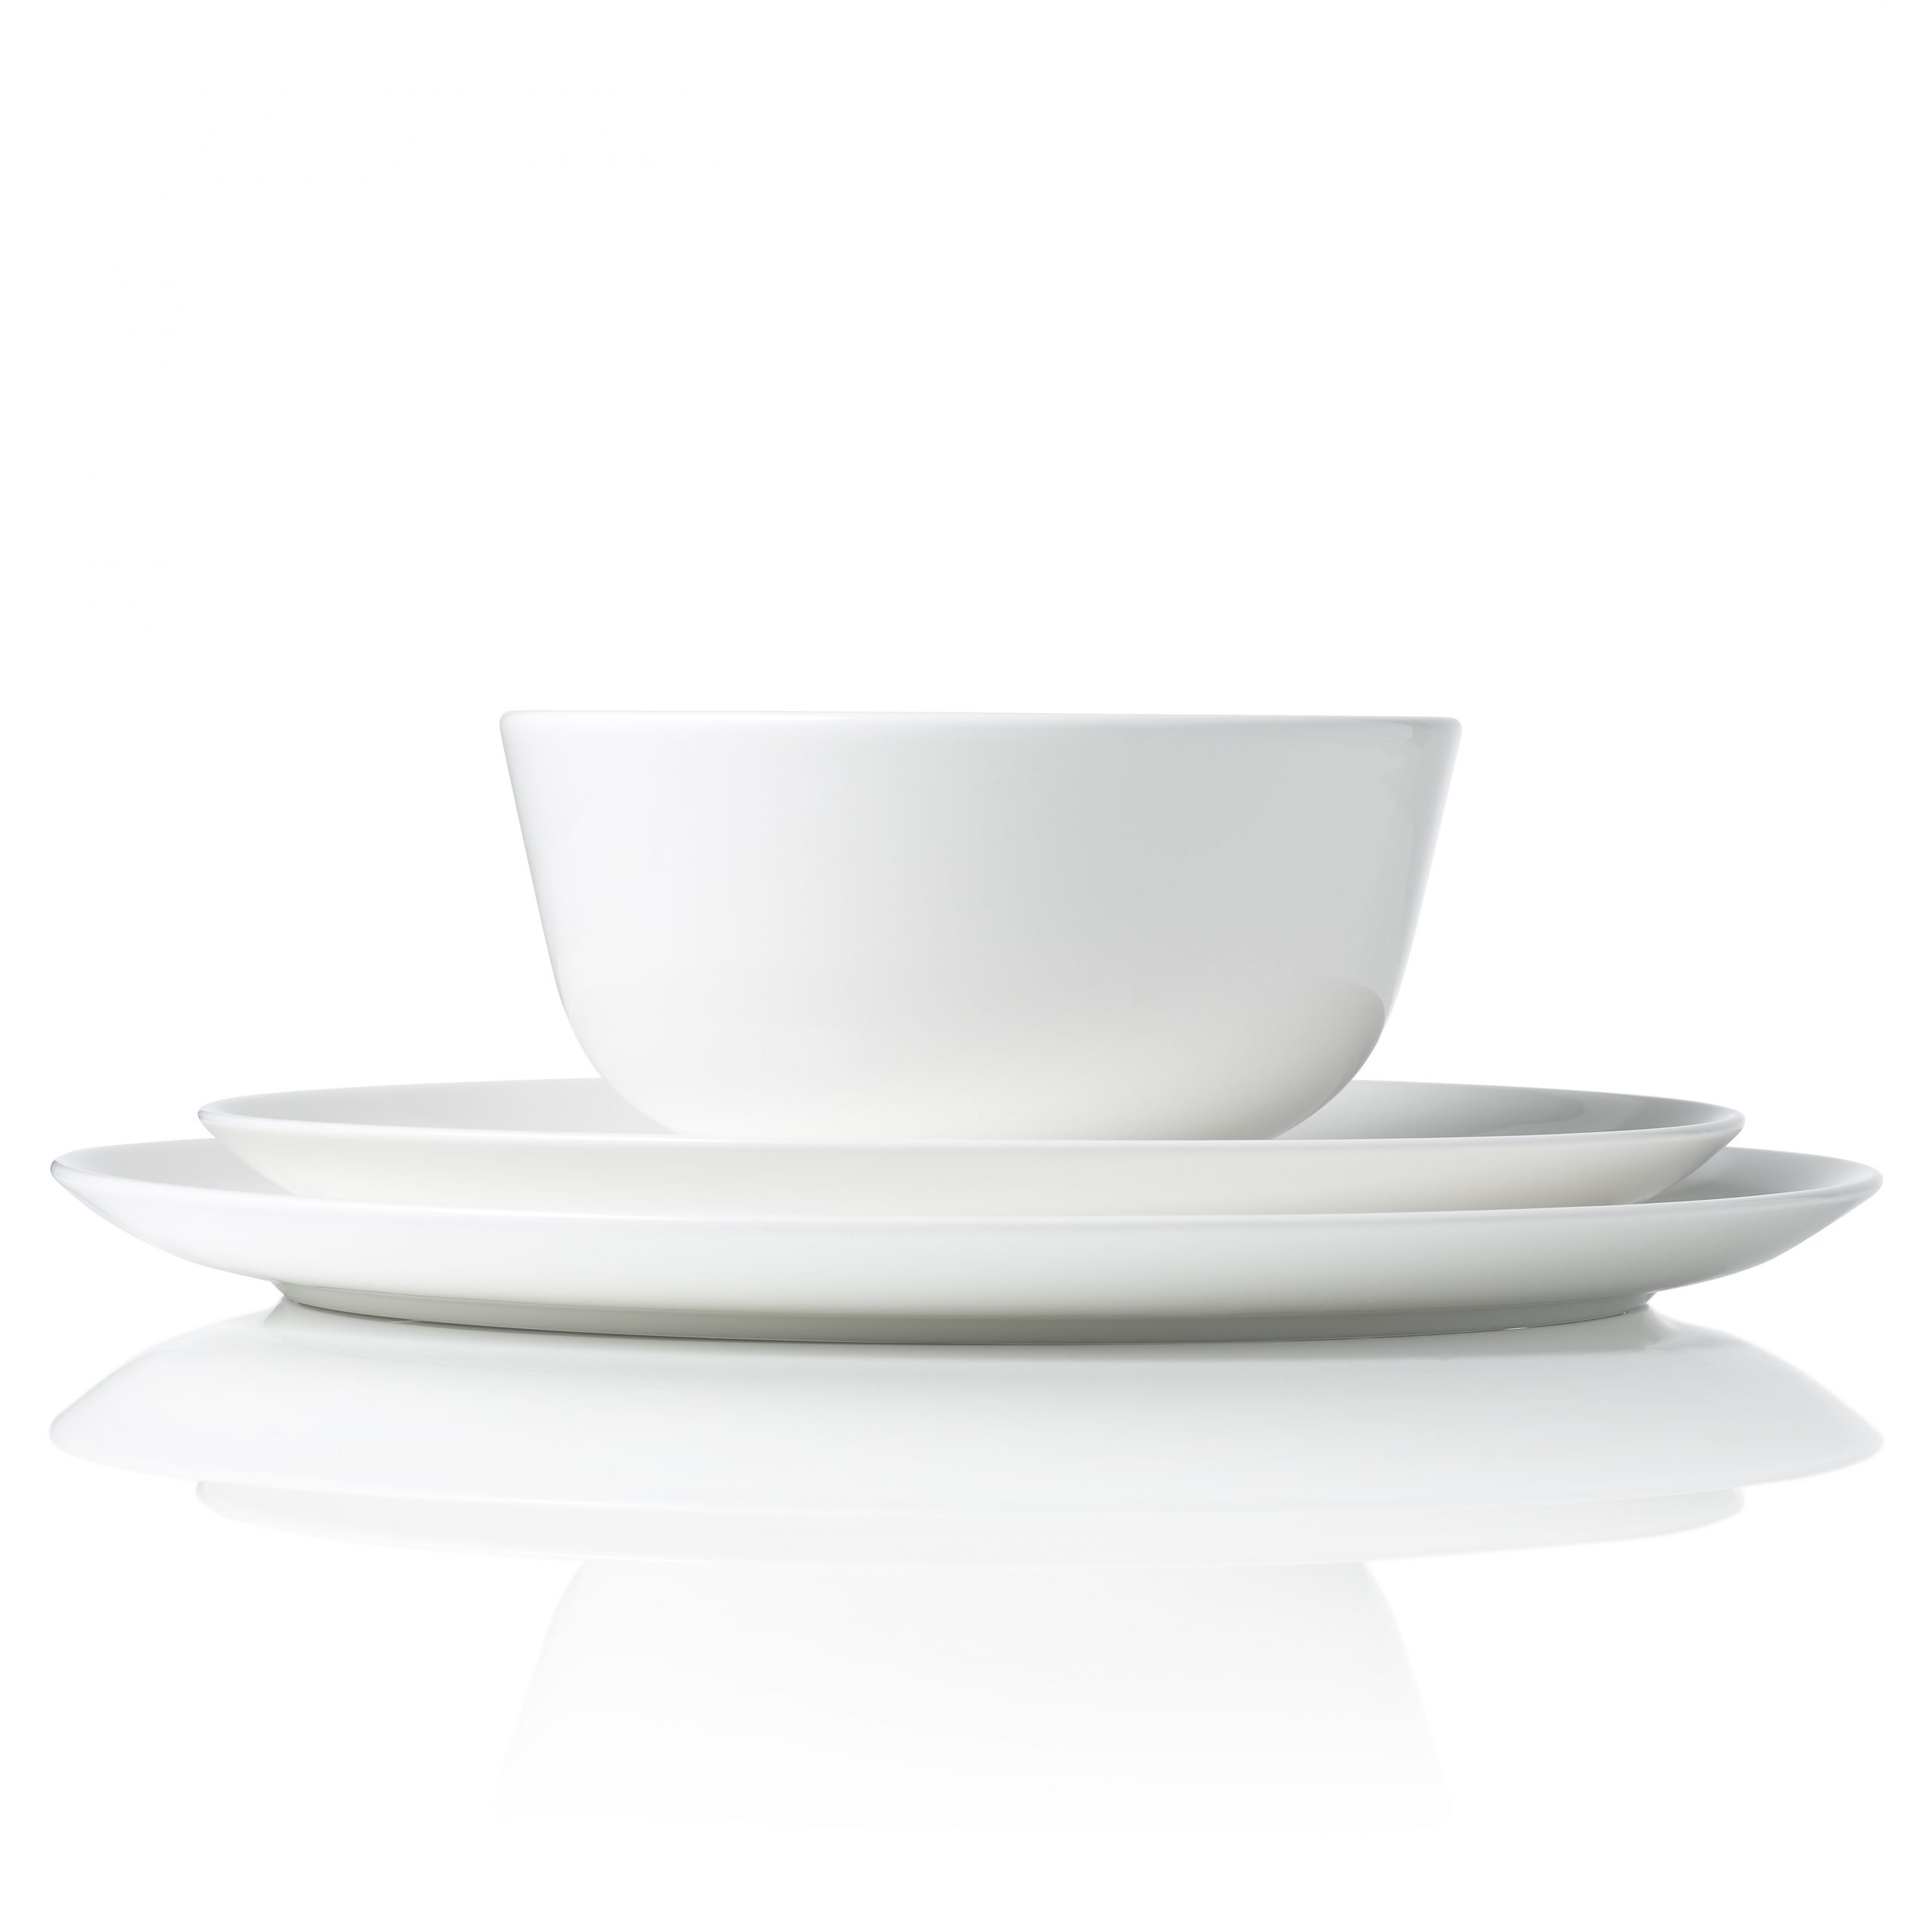 David Caon by Noritake Entree Plate Set